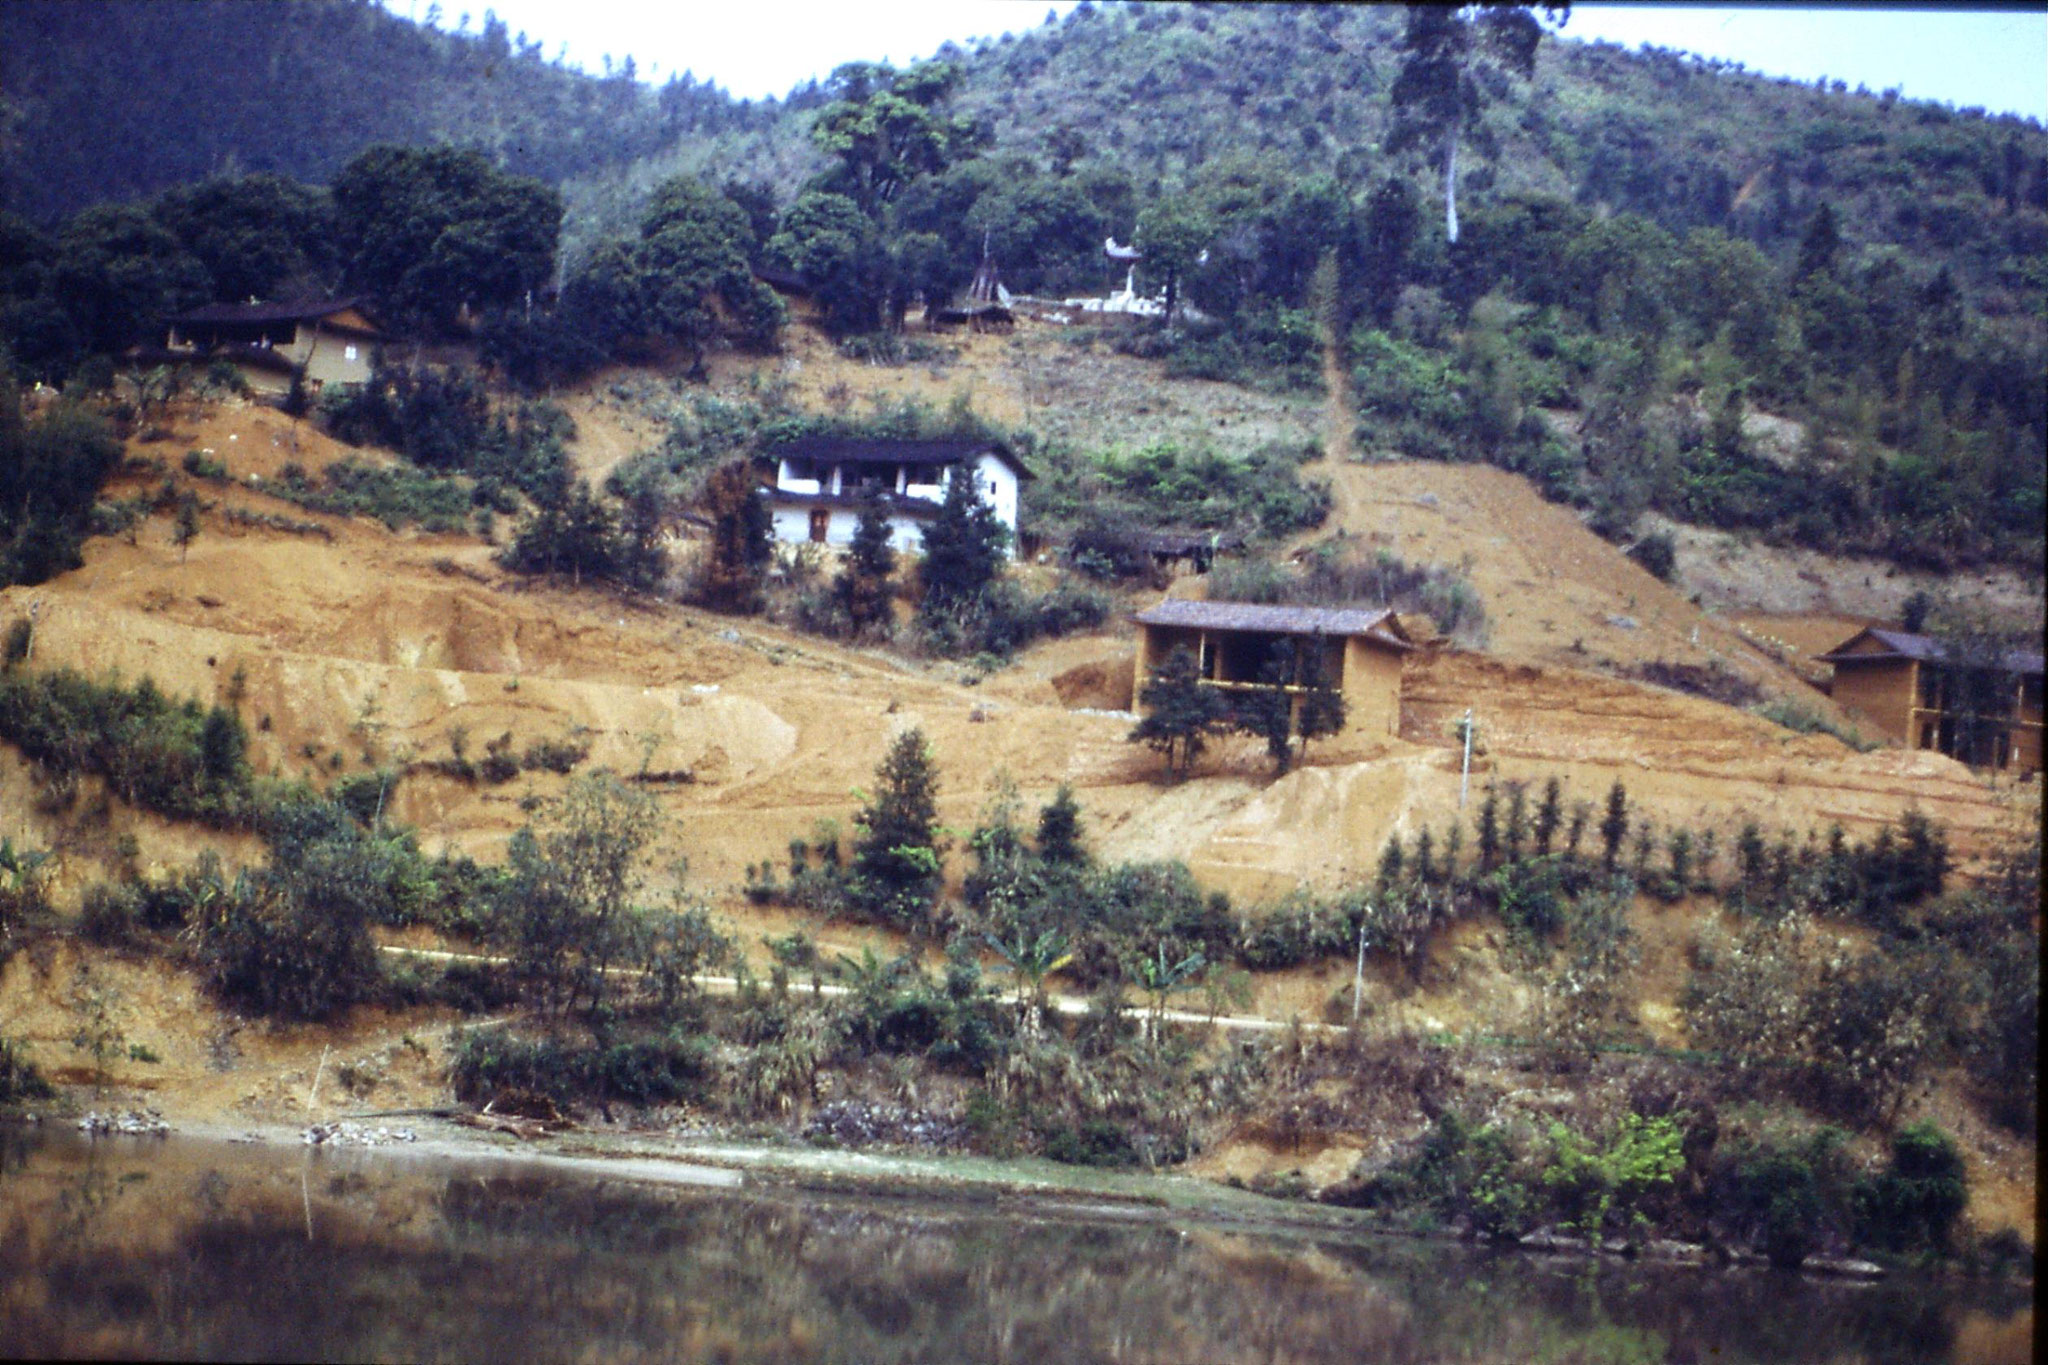 29/3/1989: 11: Fujian 1000